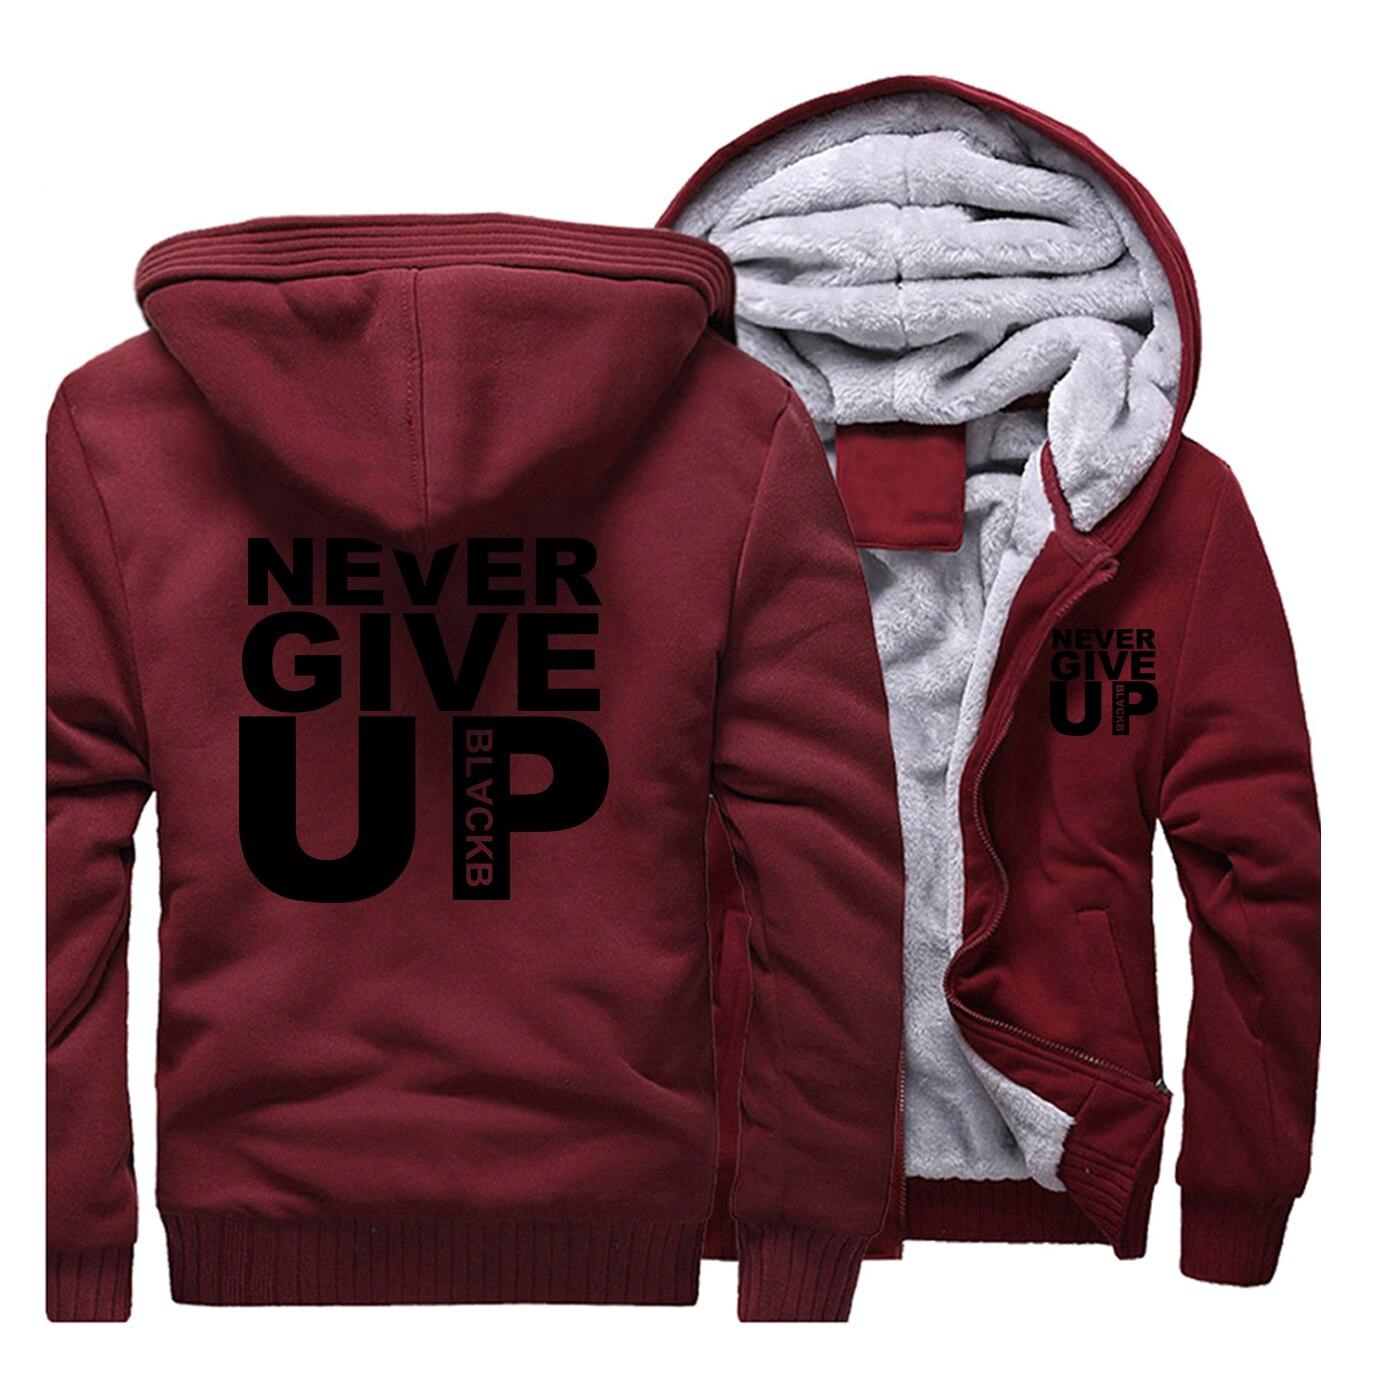 You Never Walk Alone Never Give Up Liverpool Fleece Thick  Hoodies Men Sportswear 2019 Casual Warm Sweatshirt  Streetwear Jacket